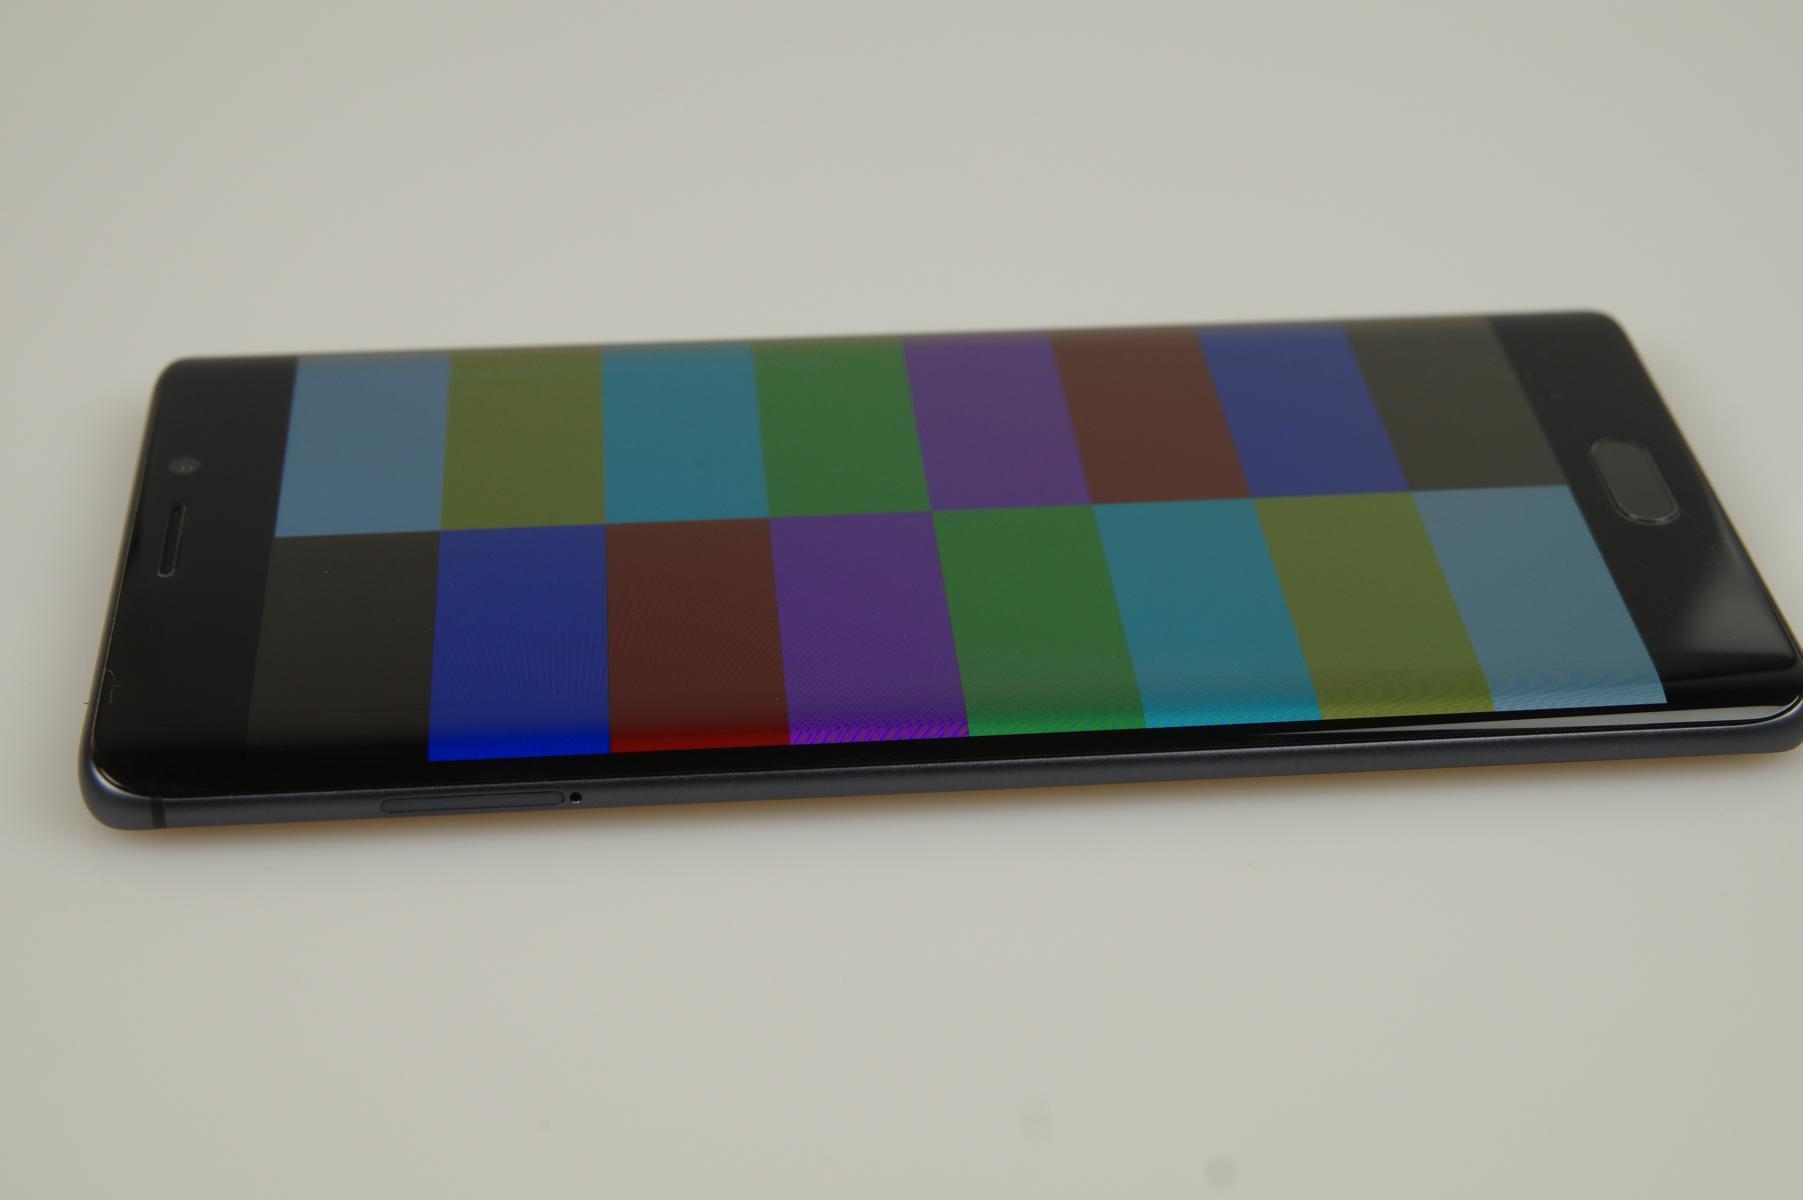 xiaomi-mi-note-2-curved-display-6